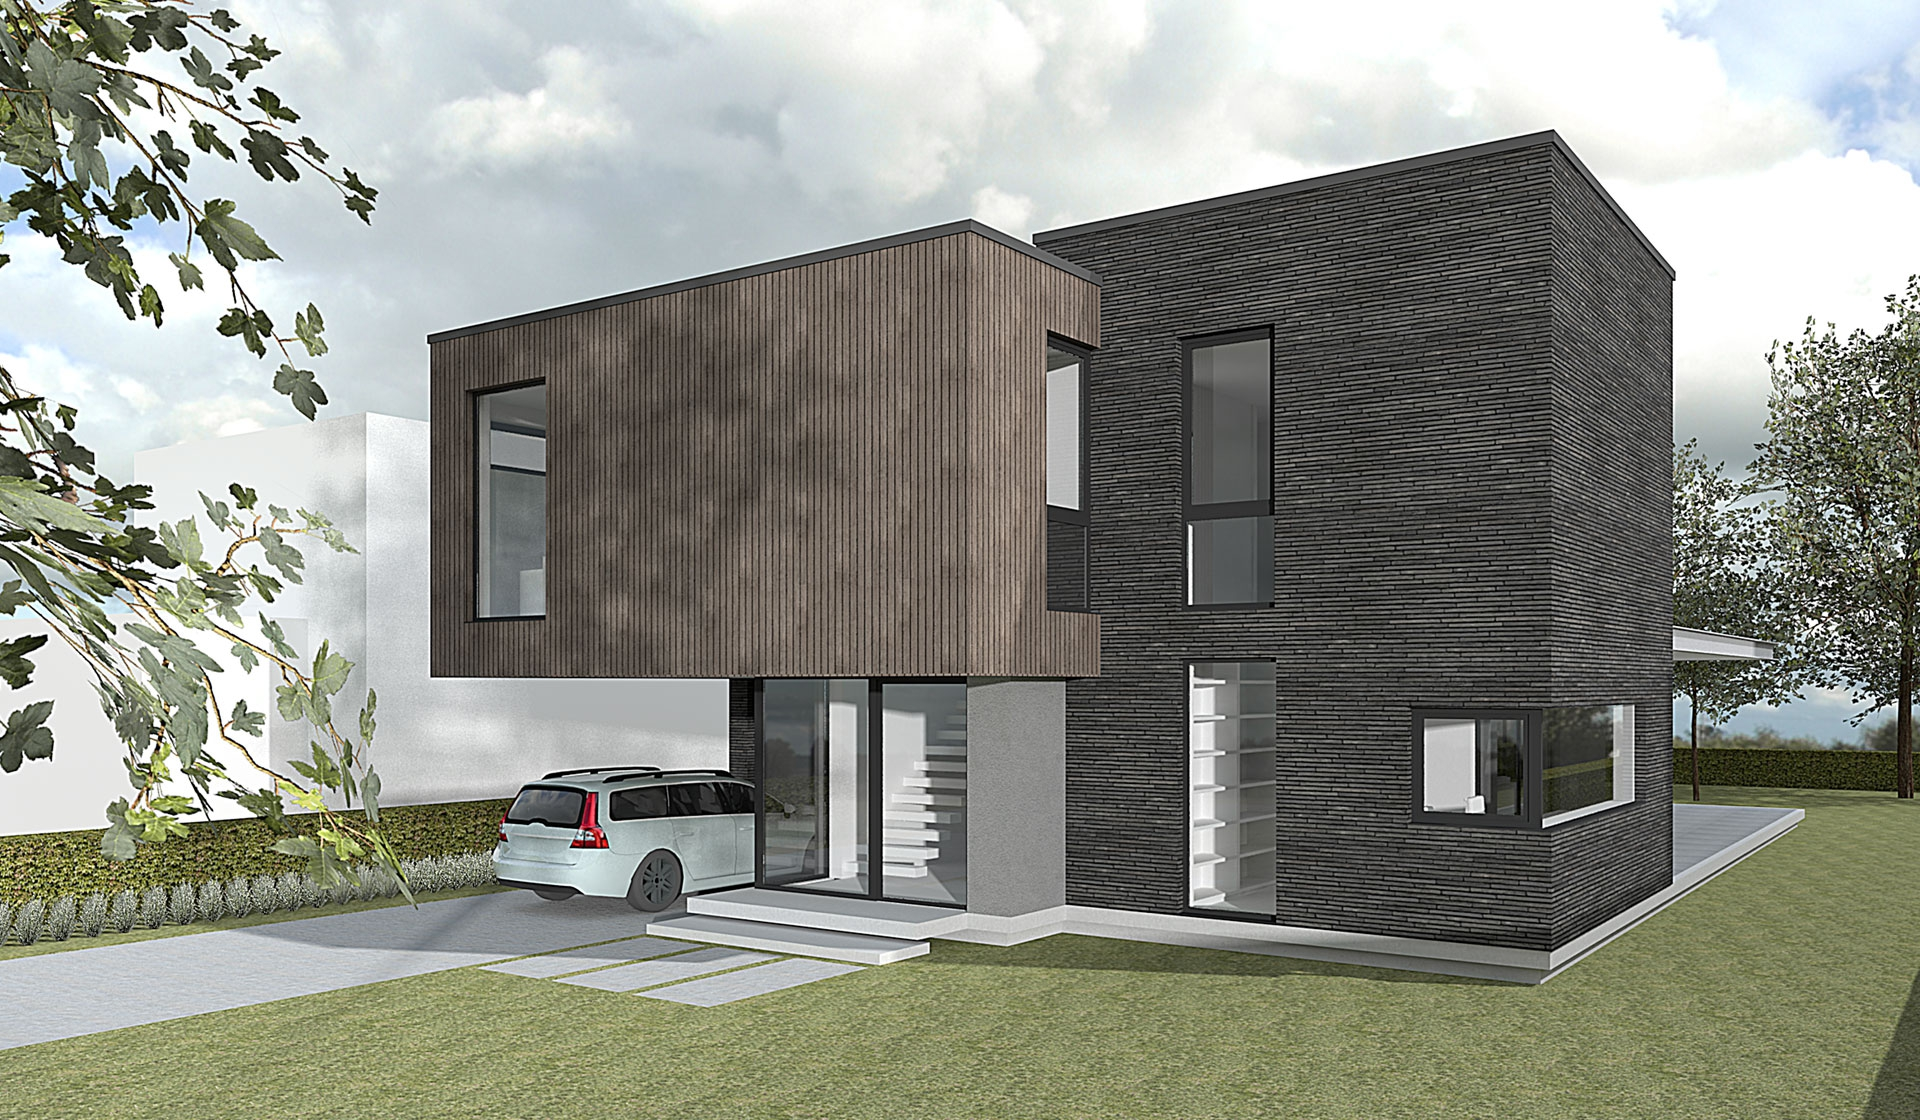 Nieuwbouw Arnhem - Het Fundament Architectuur